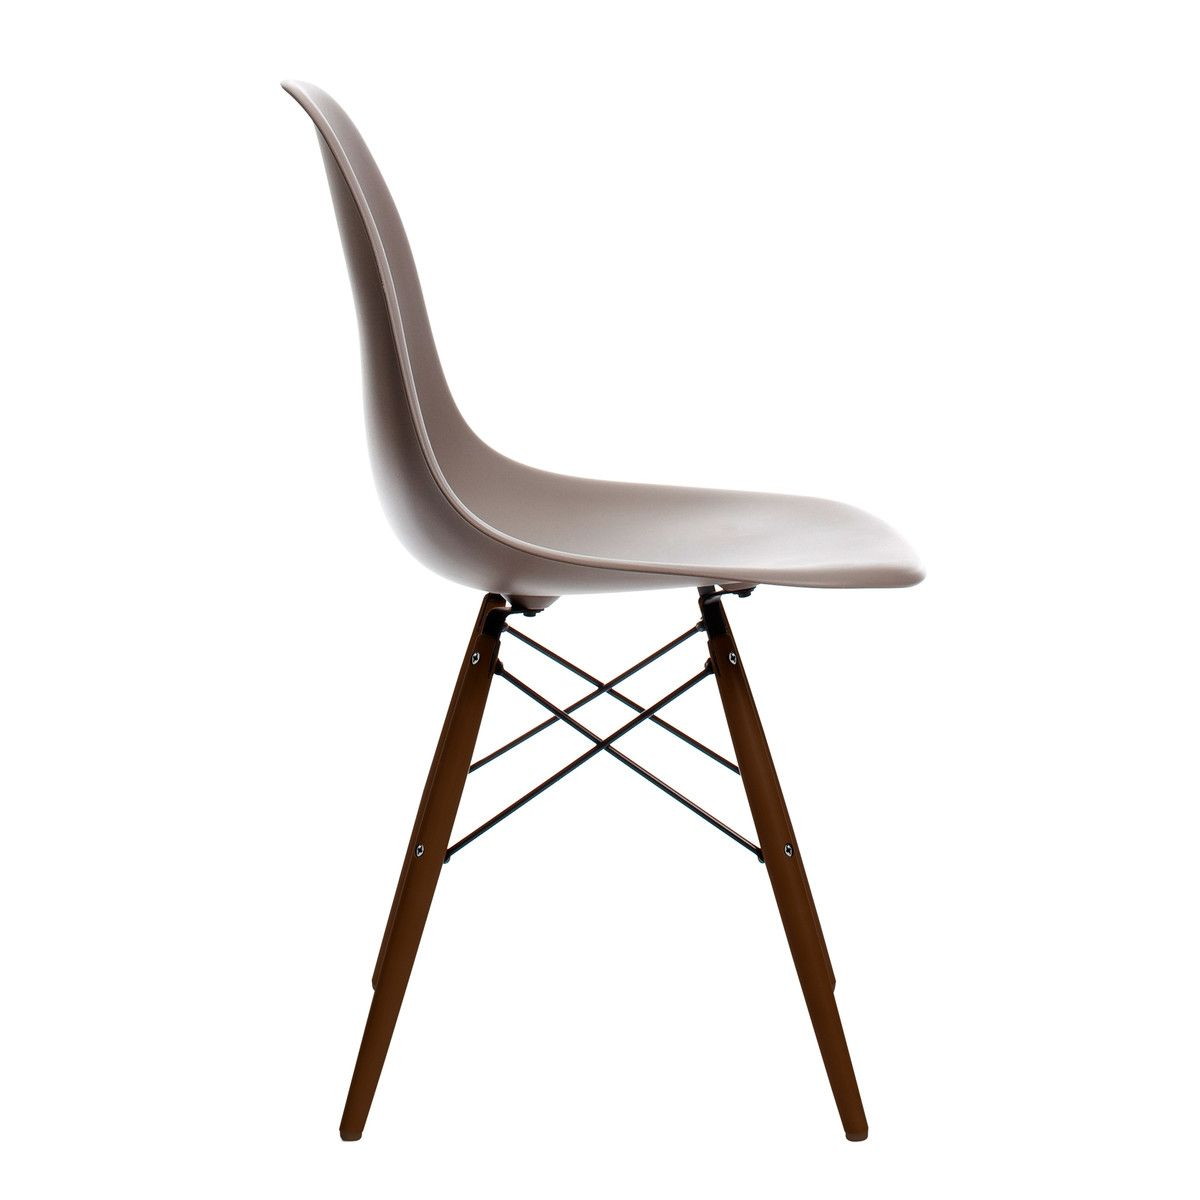 Vitra Eames Plastic Side Chair Dsw Ahorn Dunkel Mauve Grau Filzgleiter Basic Dark Eames Vitra Mobel Vitra Stuhl